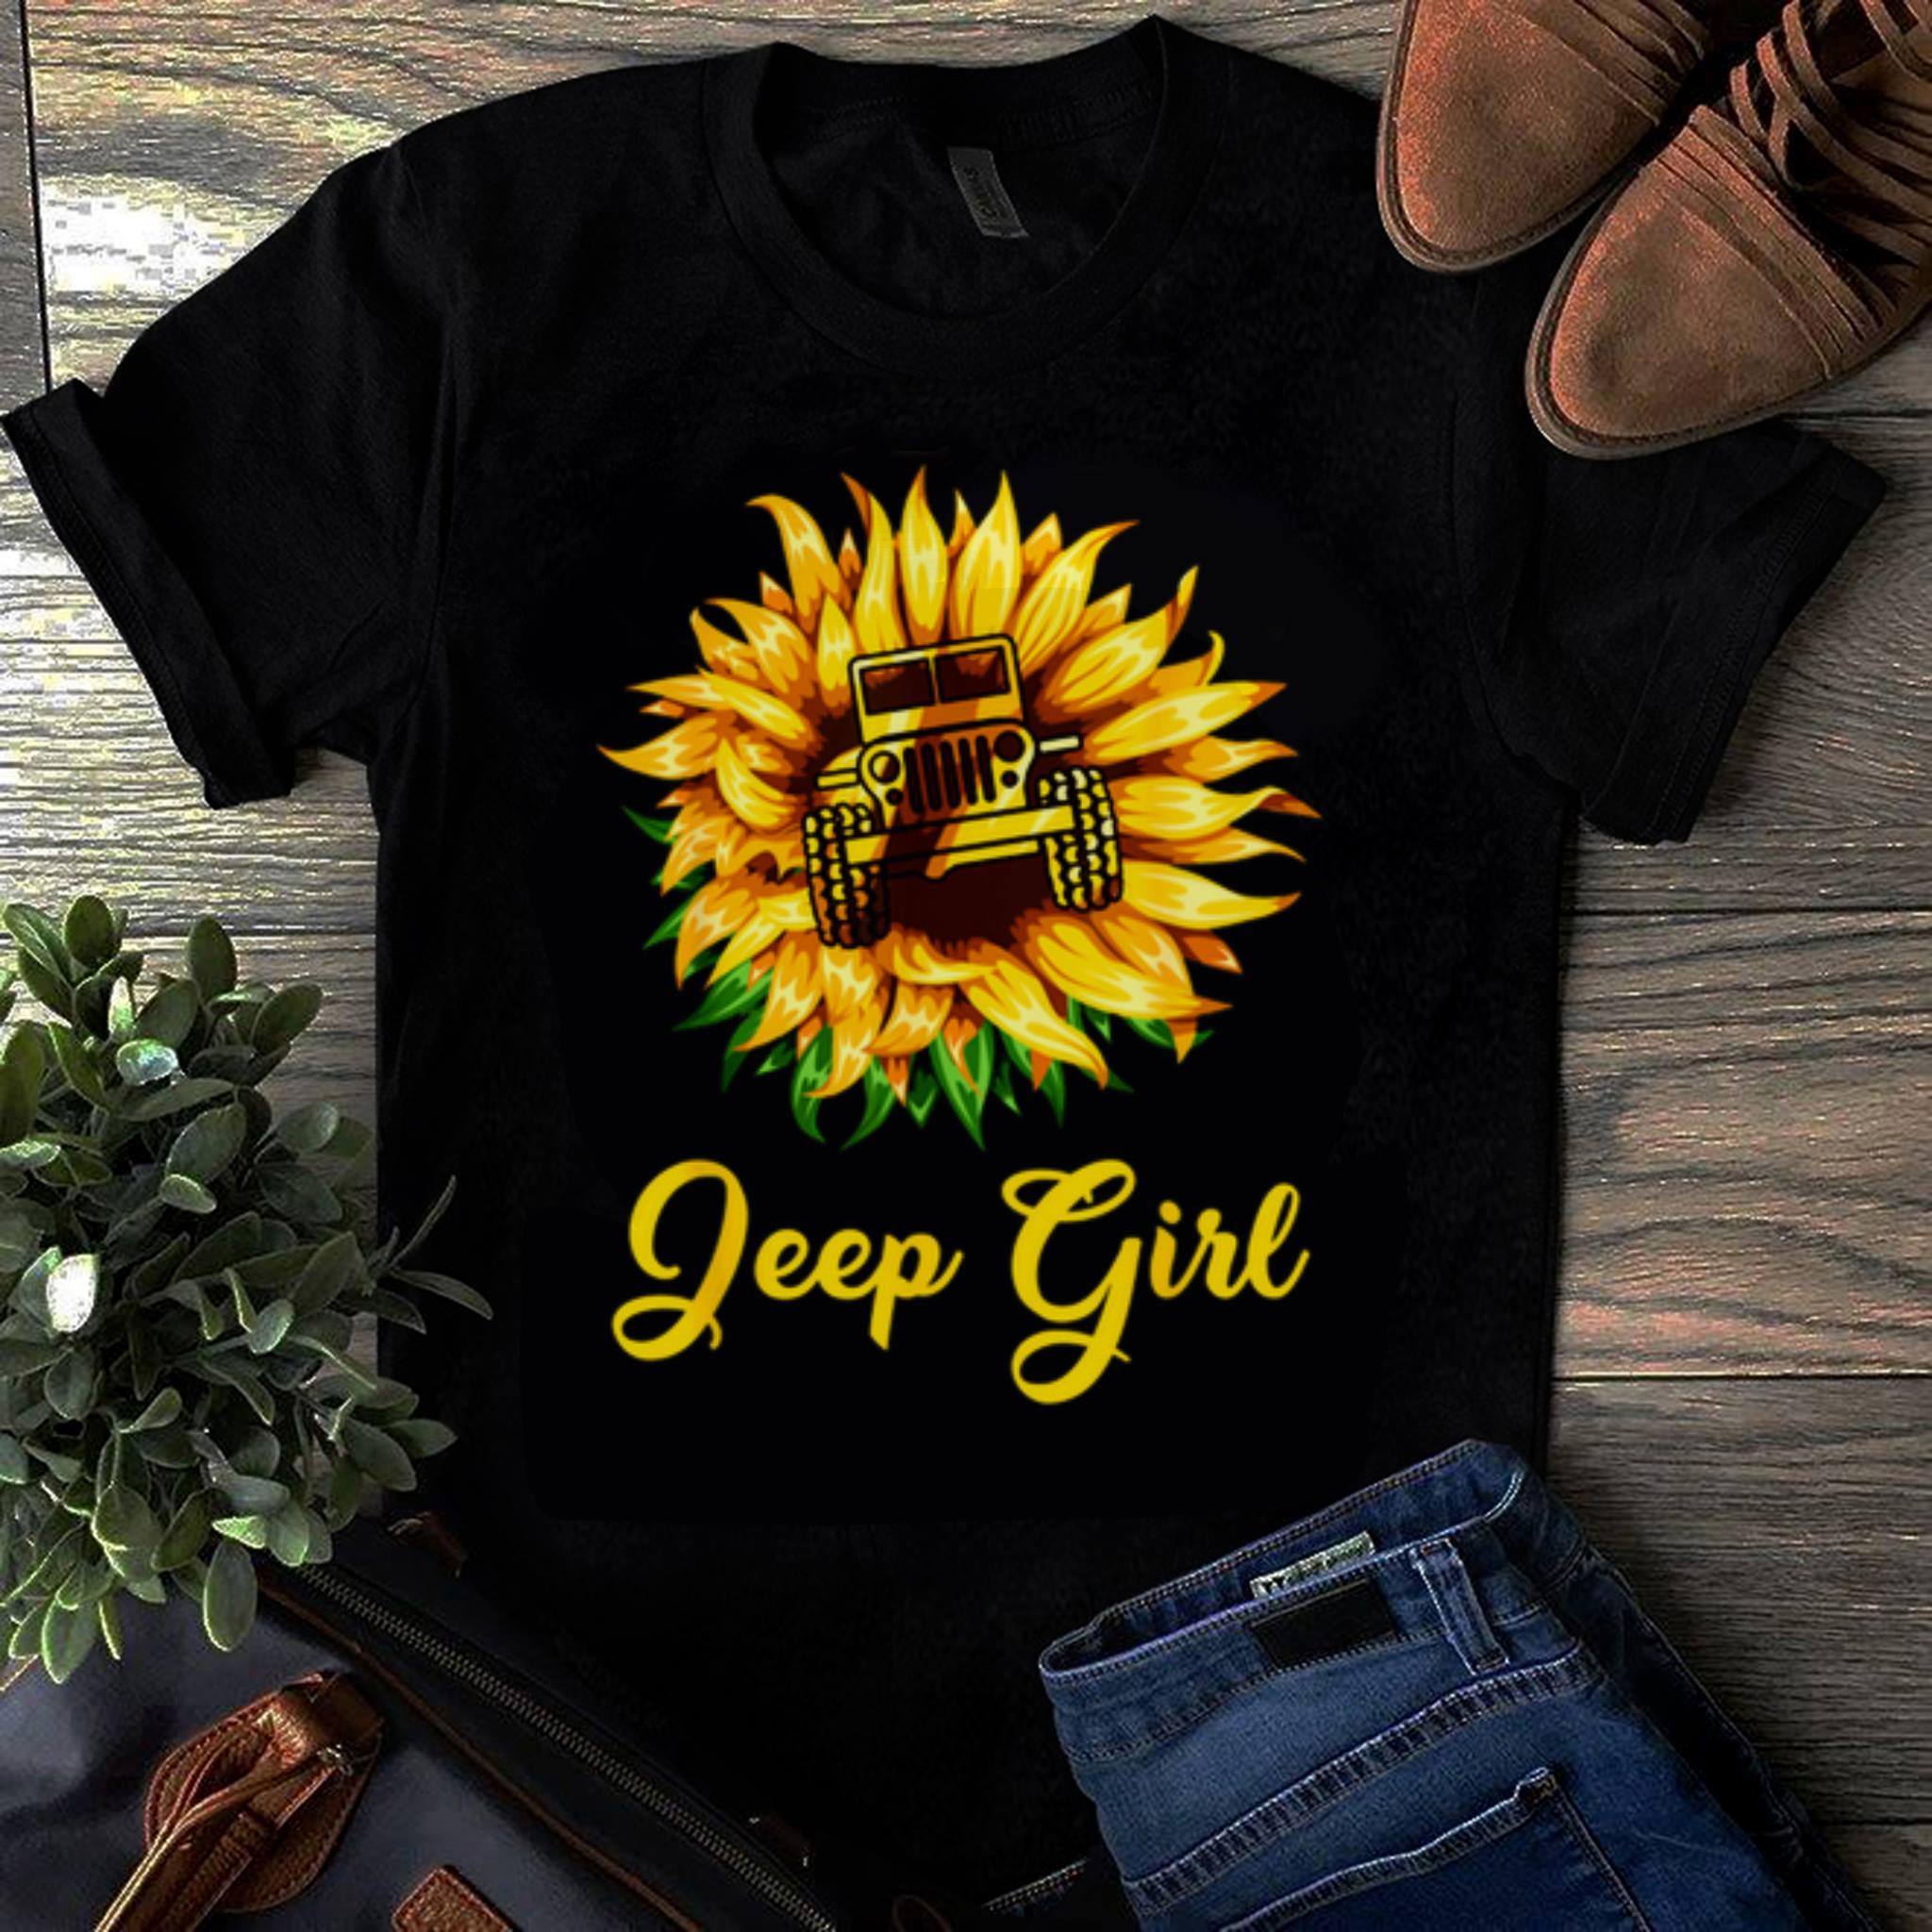 Original Sunflower Jeep Girl shirt 1 - Original Sunflower Jeep Girl shirt